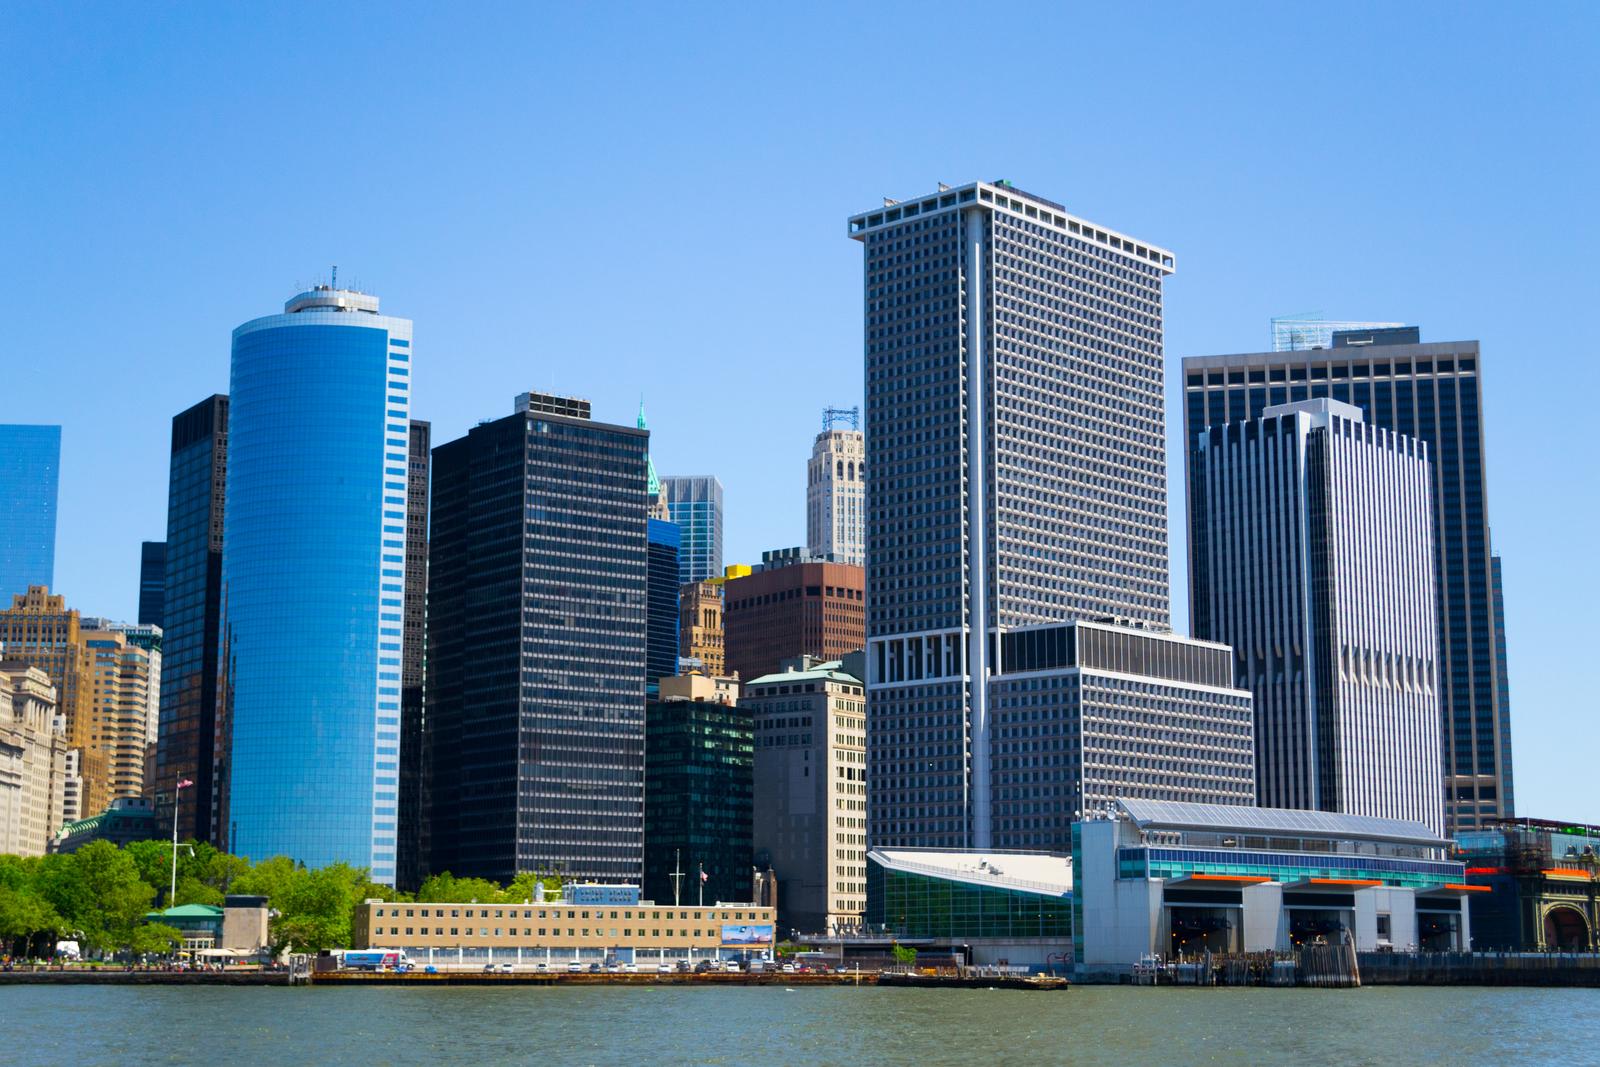 Westerleigh Staten Island, NY Private Investigator